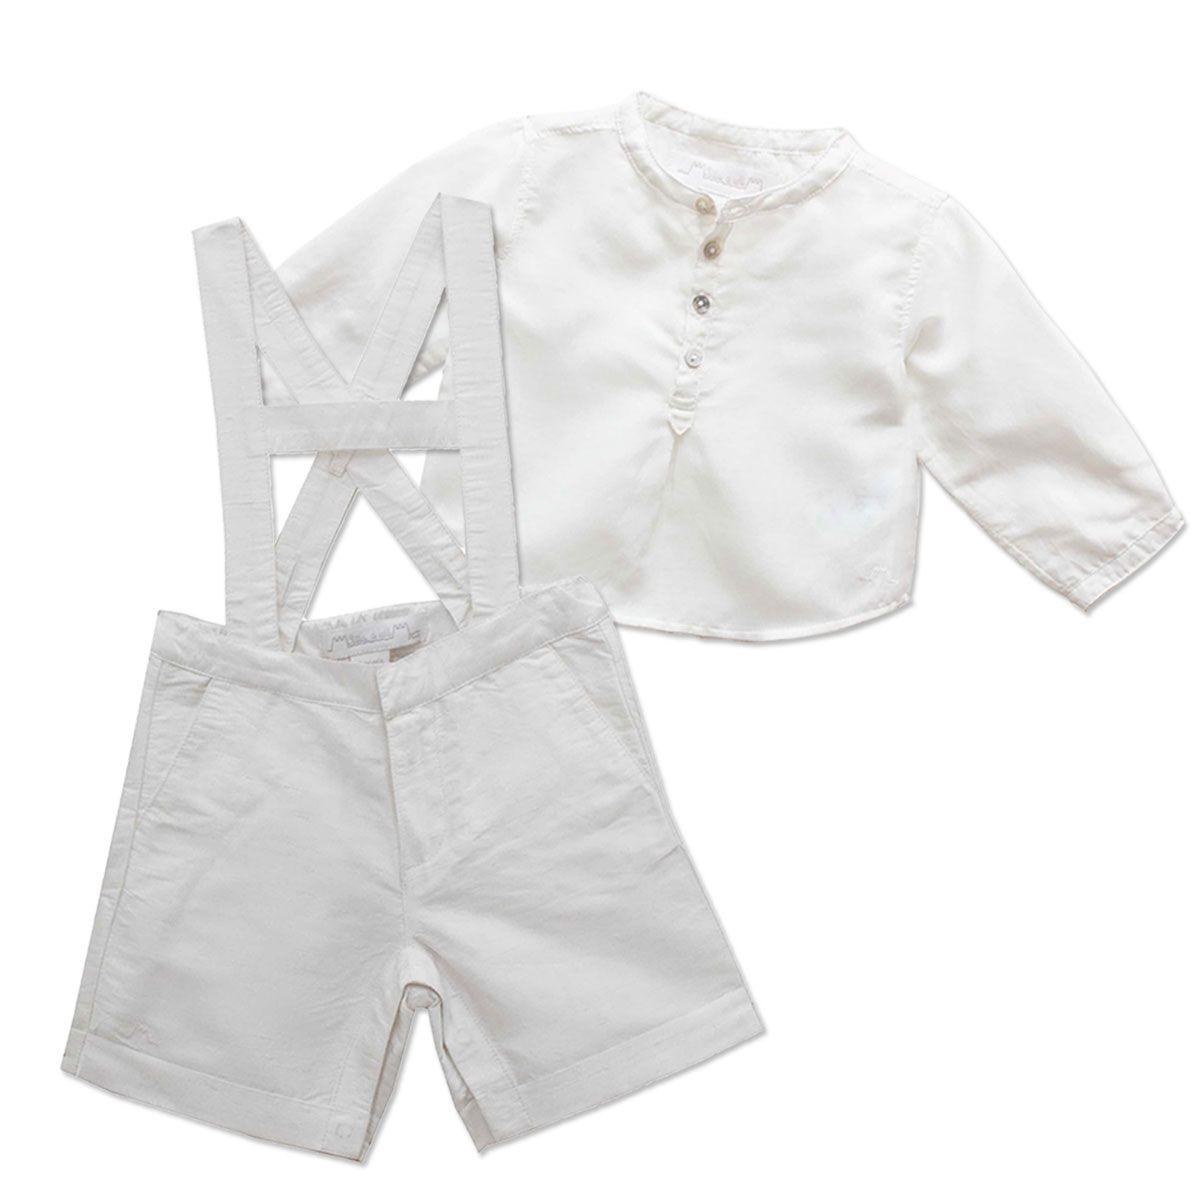 Boy Christening Outfit - Arthur | christening | Pinterest